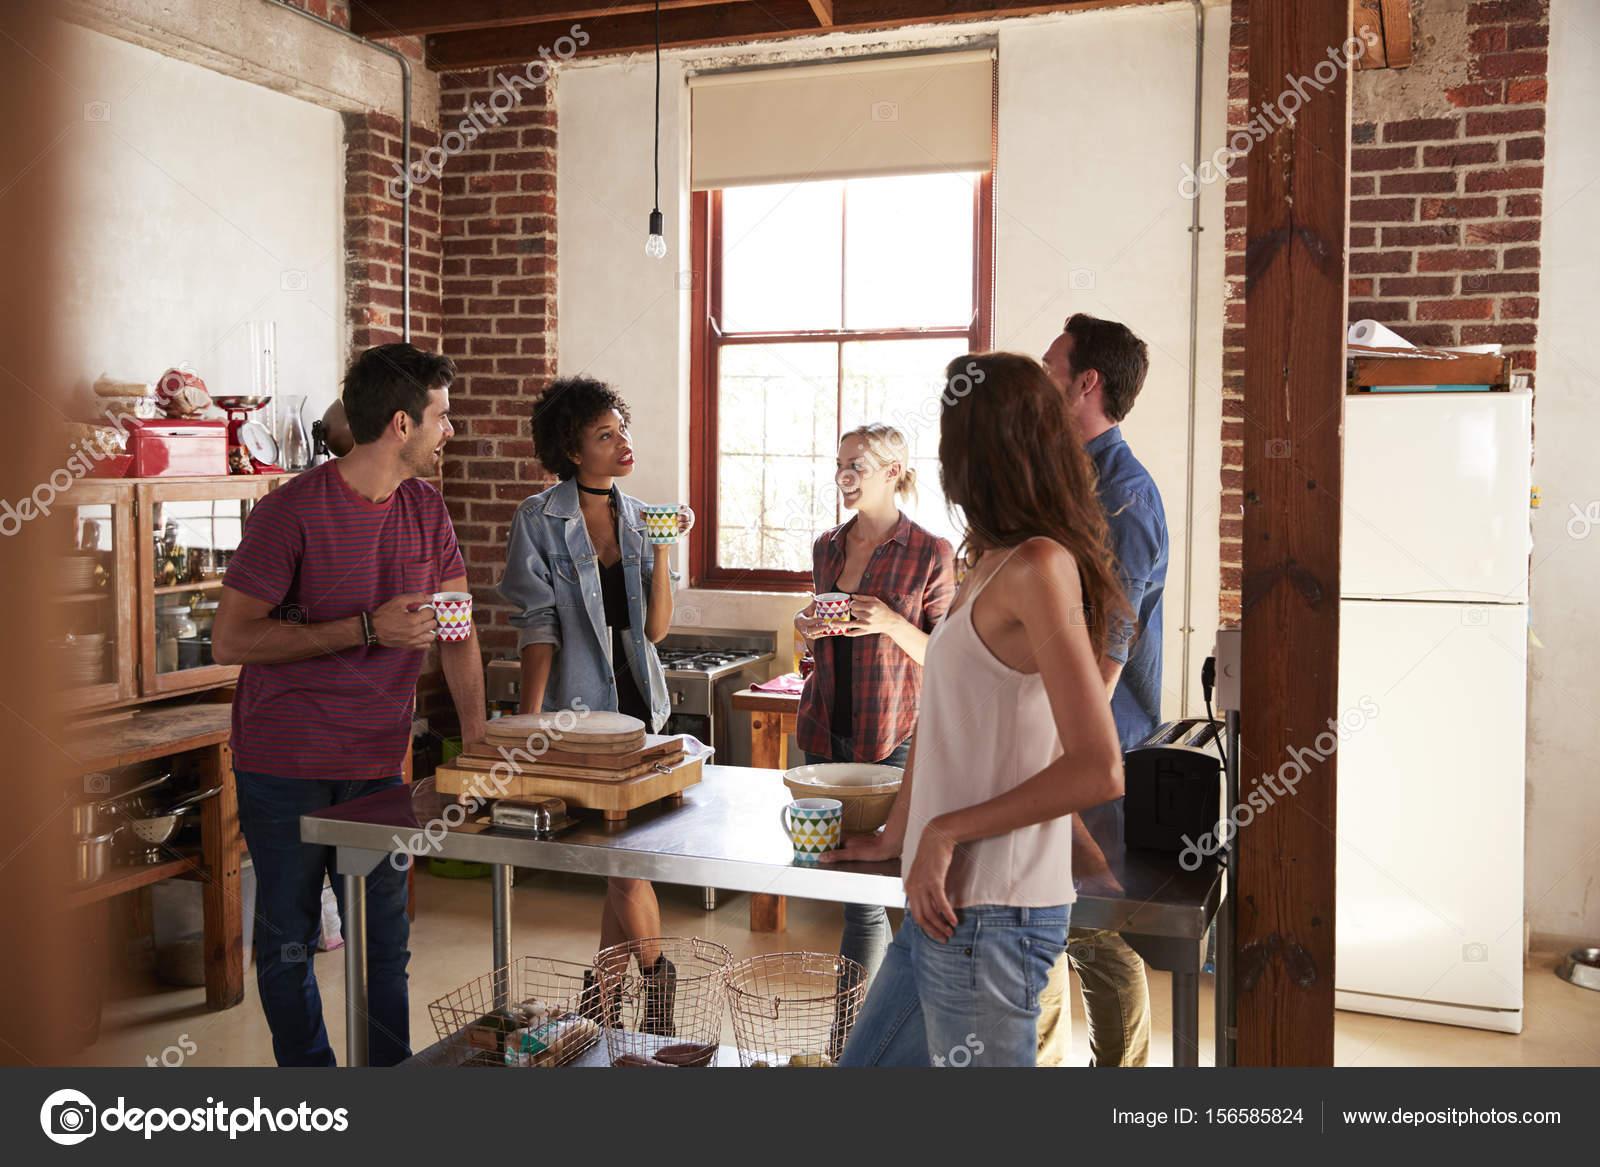 Vrienden praten over koffie in keuken u stockfoto monkeybusiness